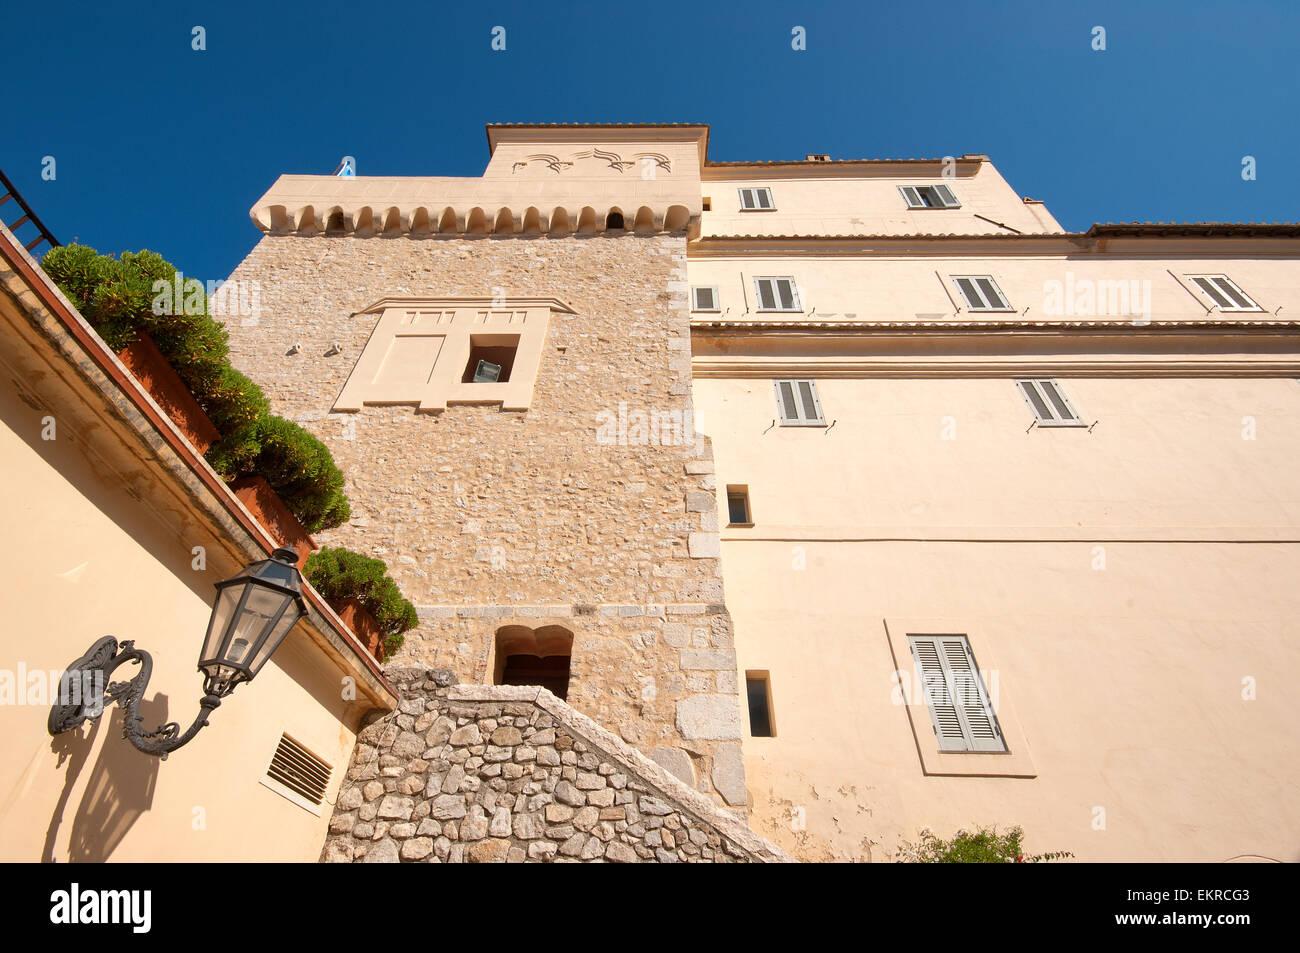 San Felice Circeo,Tower of Templar Knights, Lazio, Italy - Stock Image